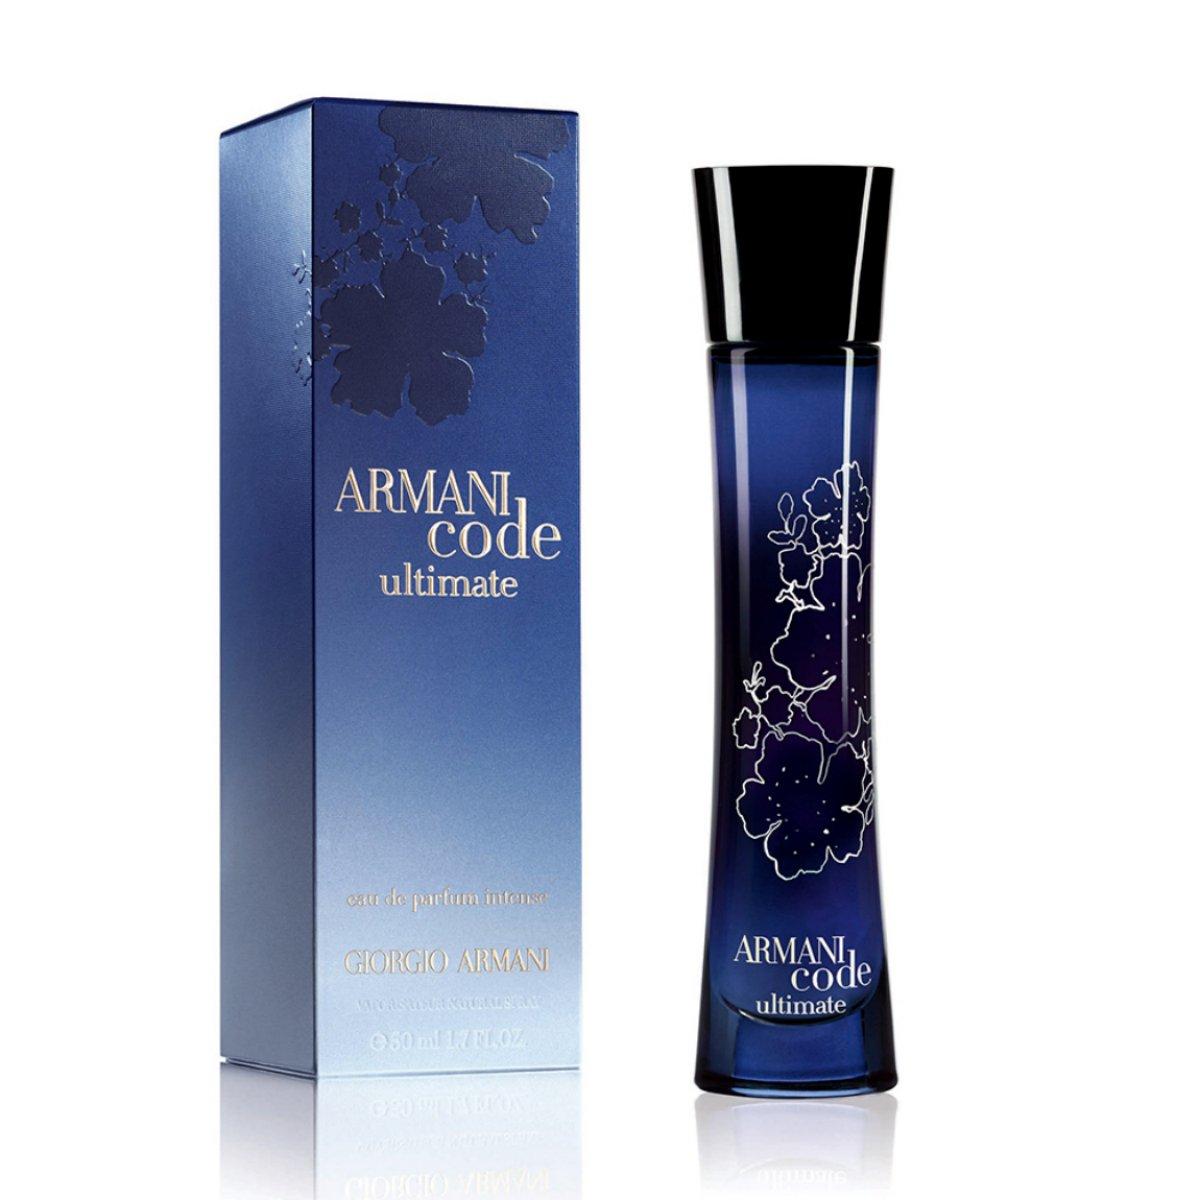 56e6b2a989d viporte  Giorgio Armani code ultimate intense EDP Eau de Parfum SP 50 ml GIORGIO  ARMANI CODE ULTIMATE INTENSE POUR FEMME EAU DE PARFUM SPRAY